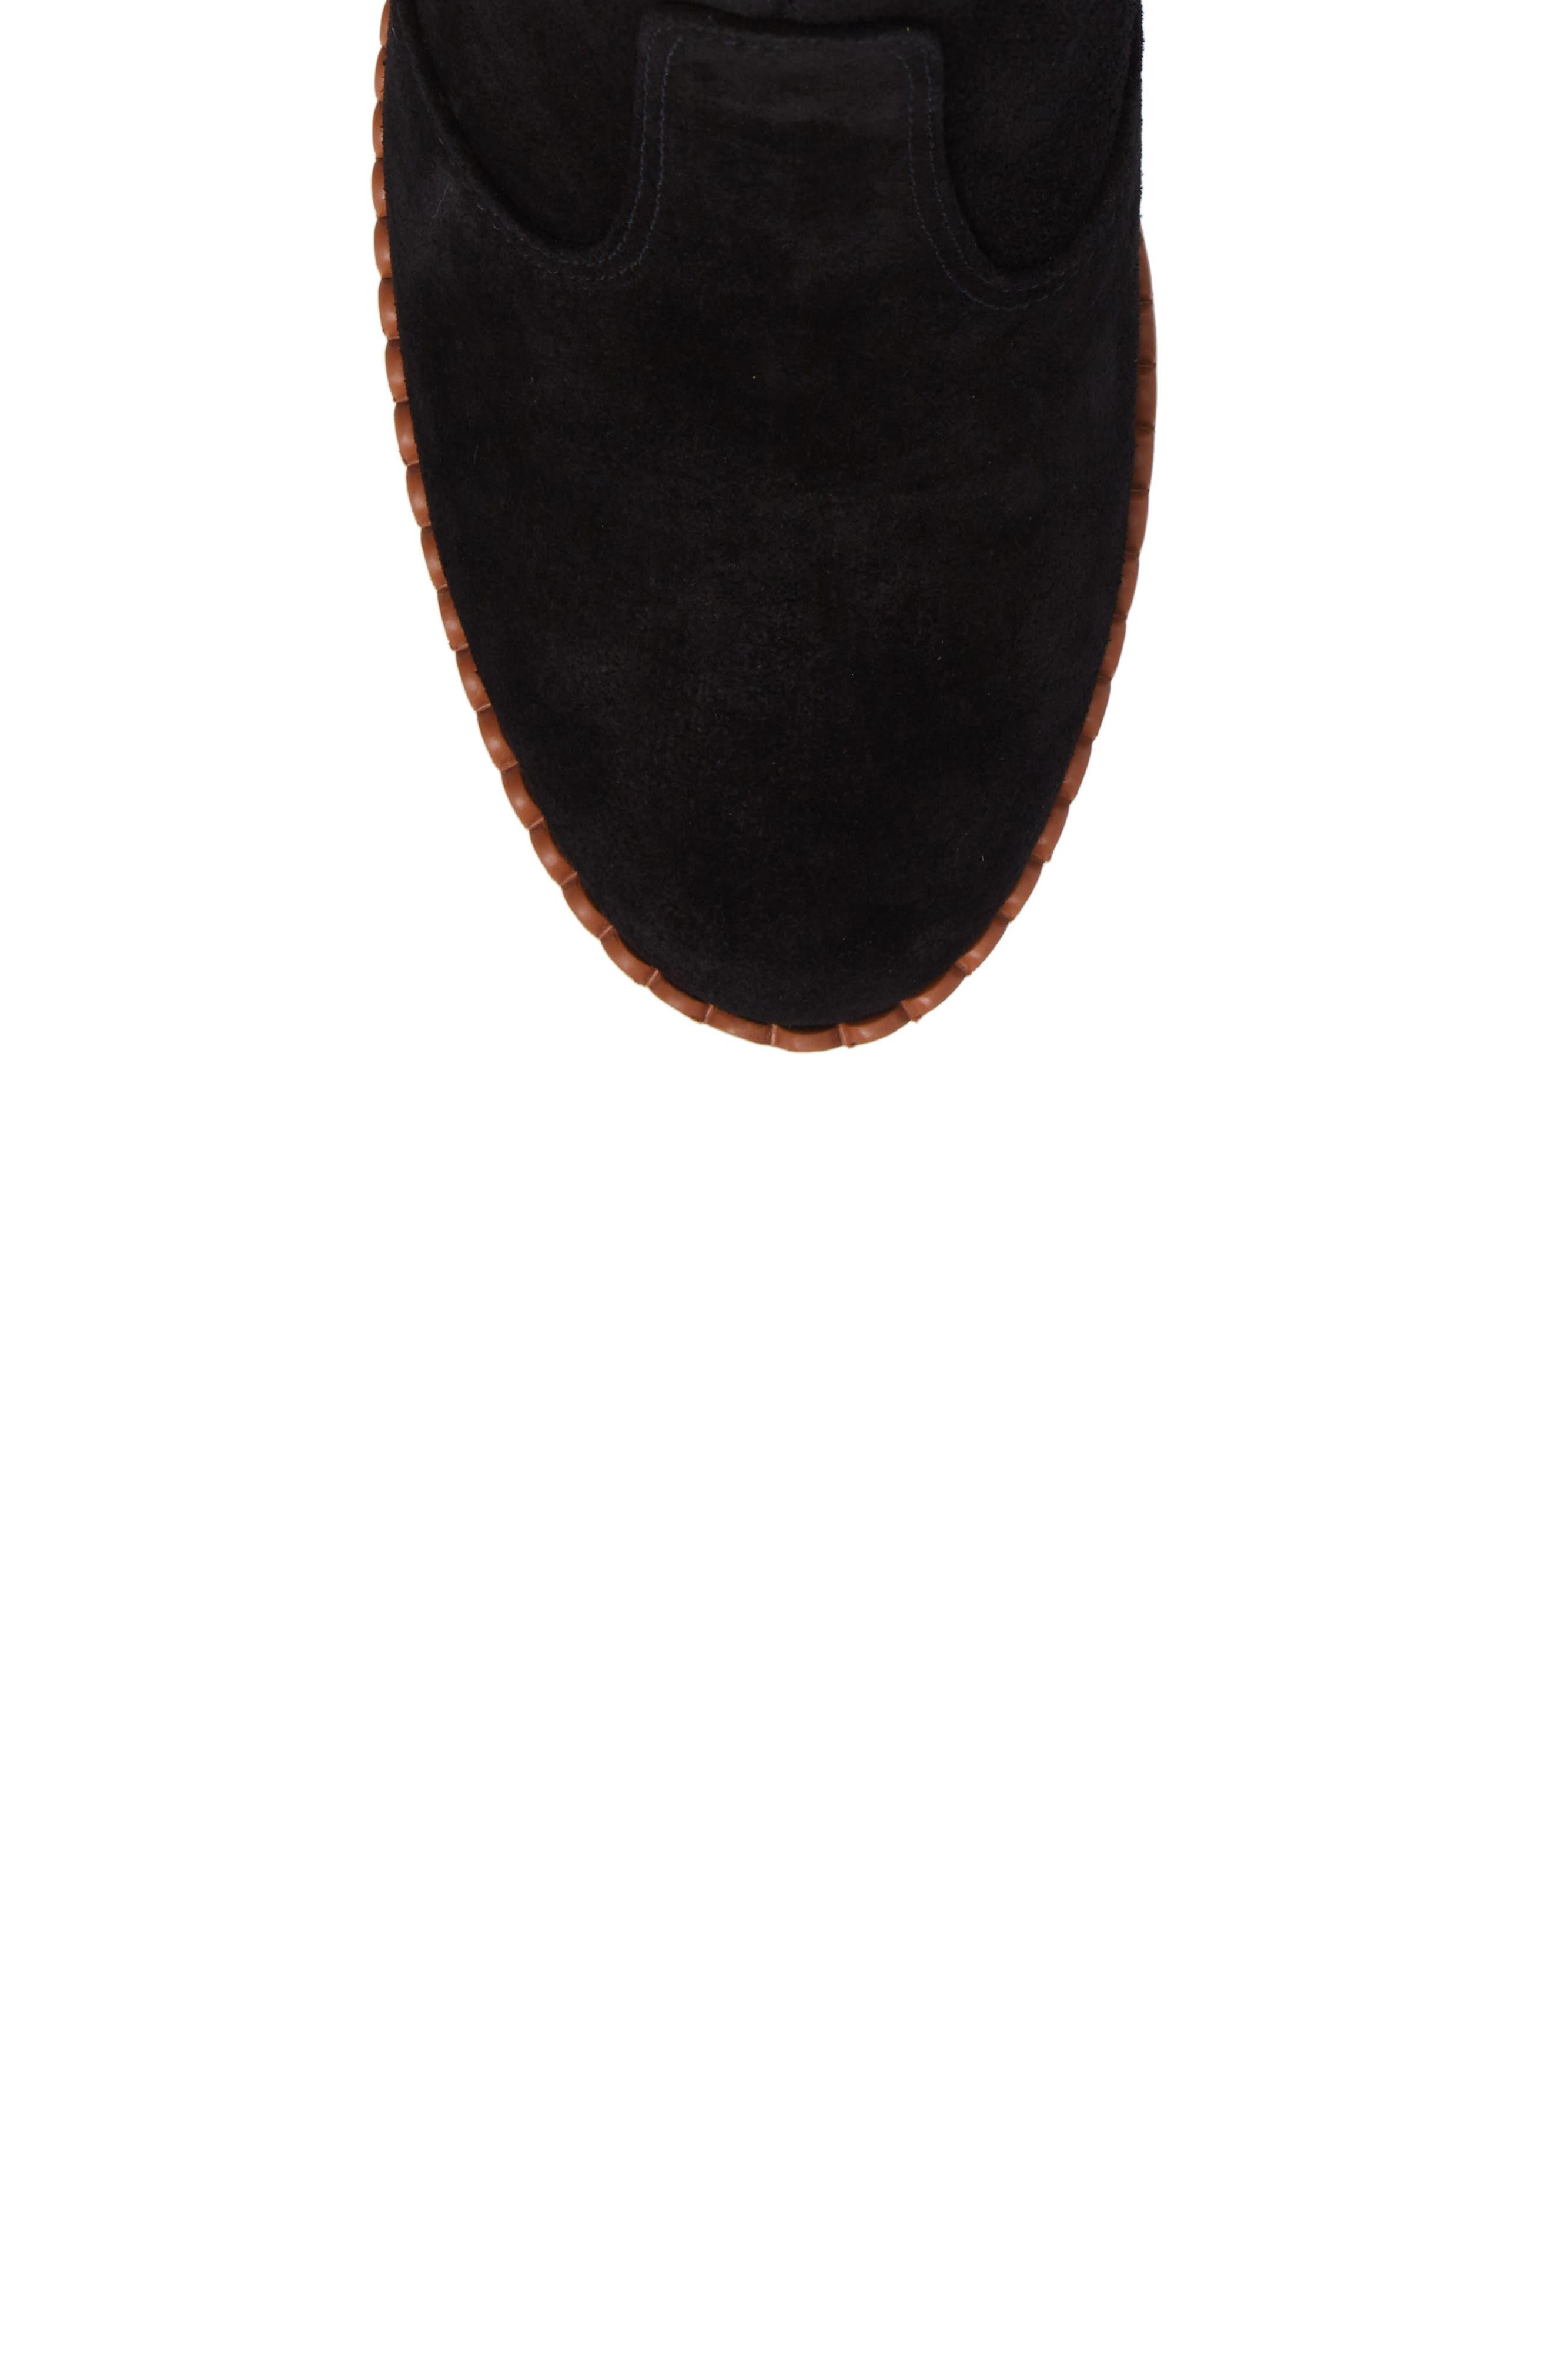 Stasya Block Heel Bootie,                             Alternate thumbnail 5, color,                             Black